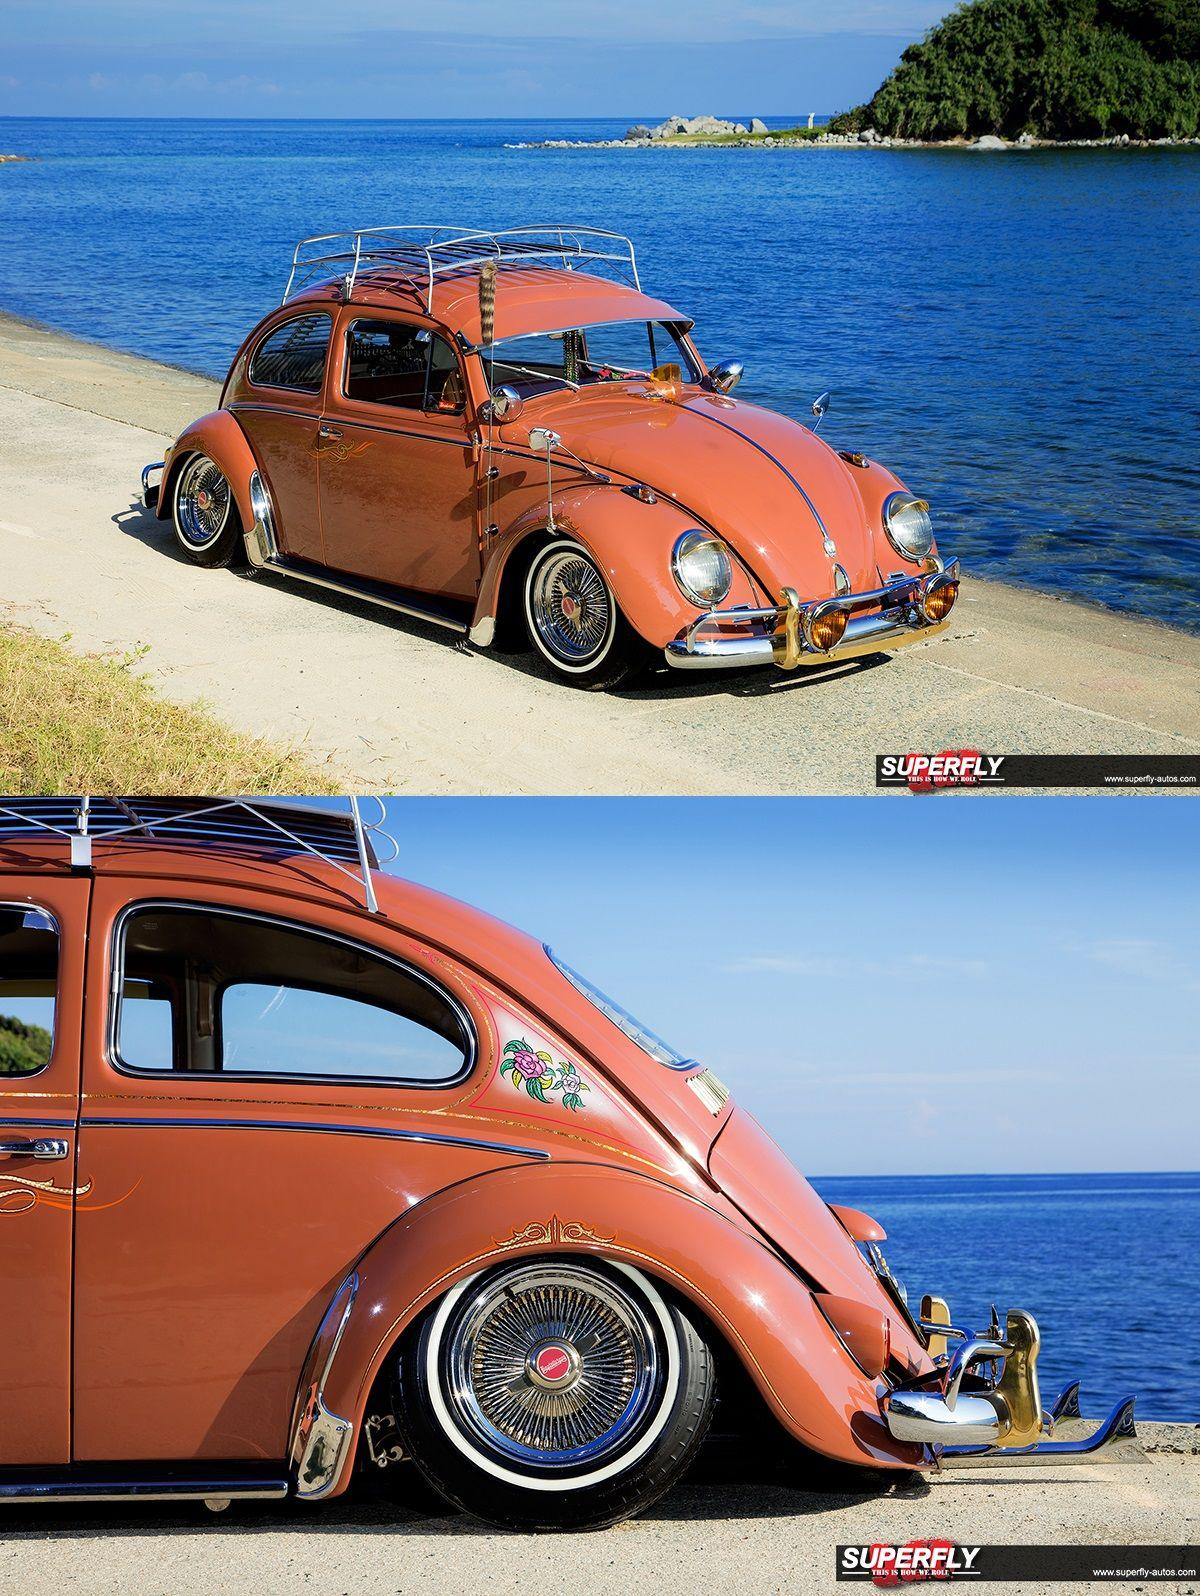 VW Fusca Beetle | VW City | Vw cars, Volkswagen, Vw beetles